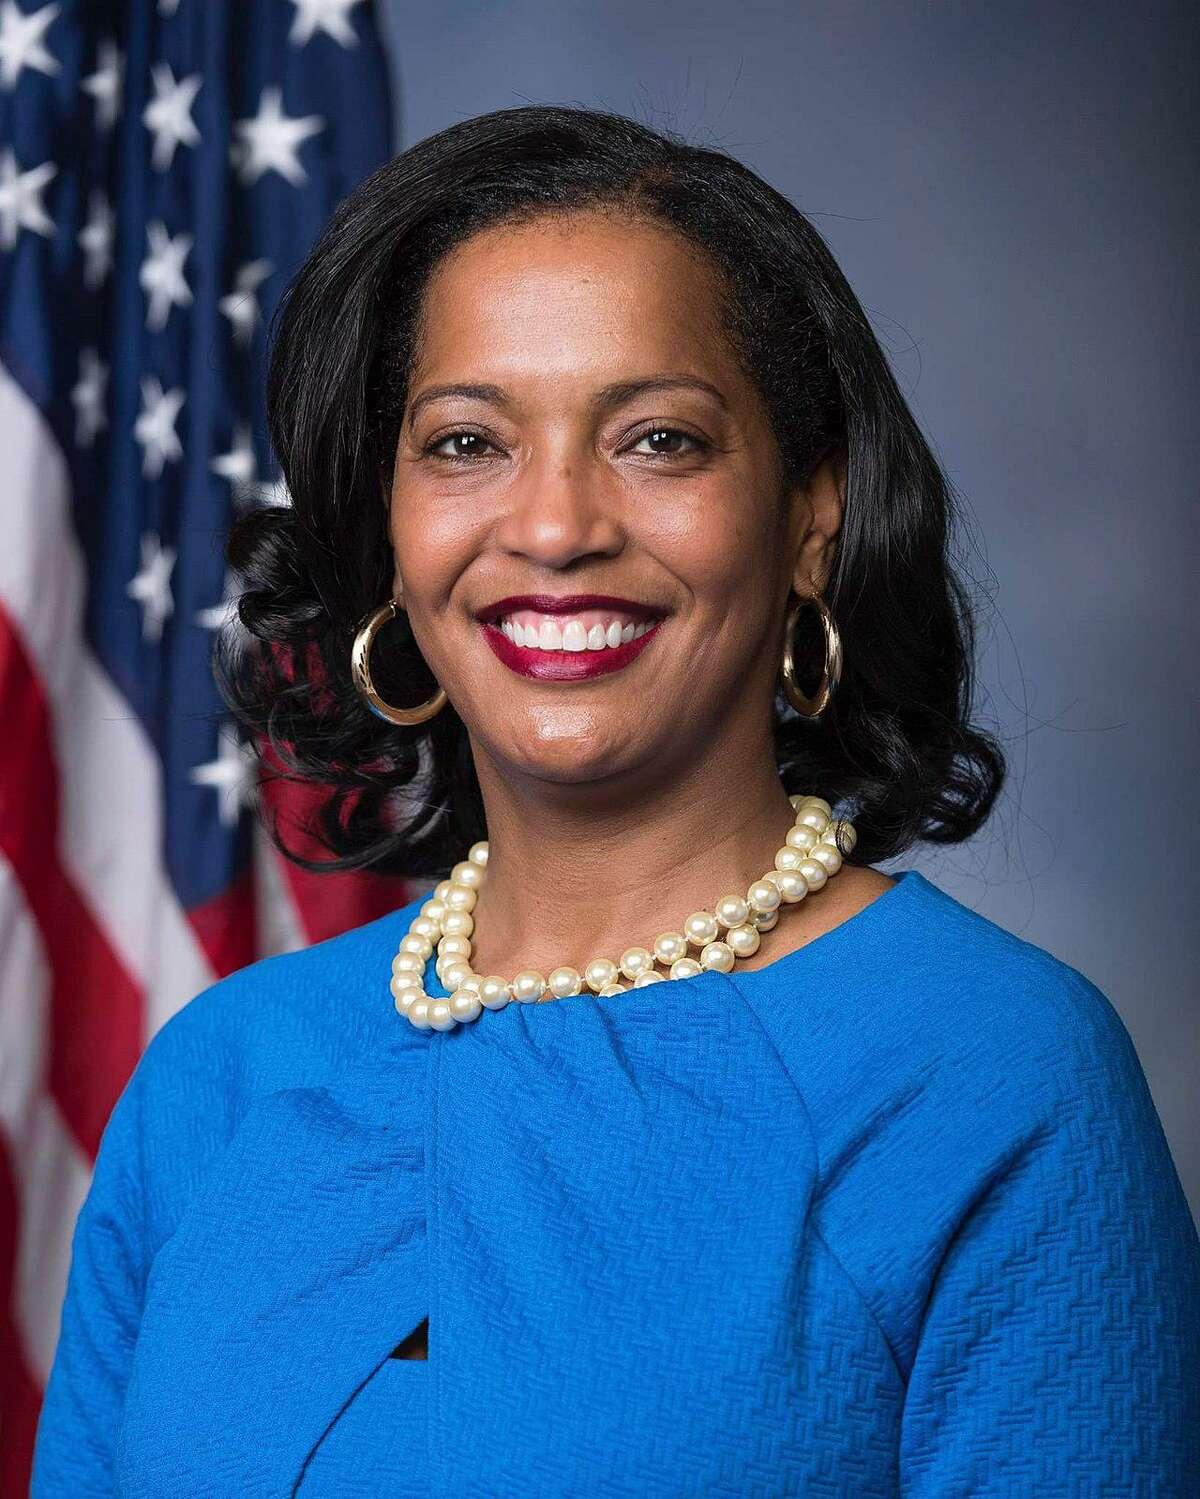 U.S. Rep. Jahana Hayes